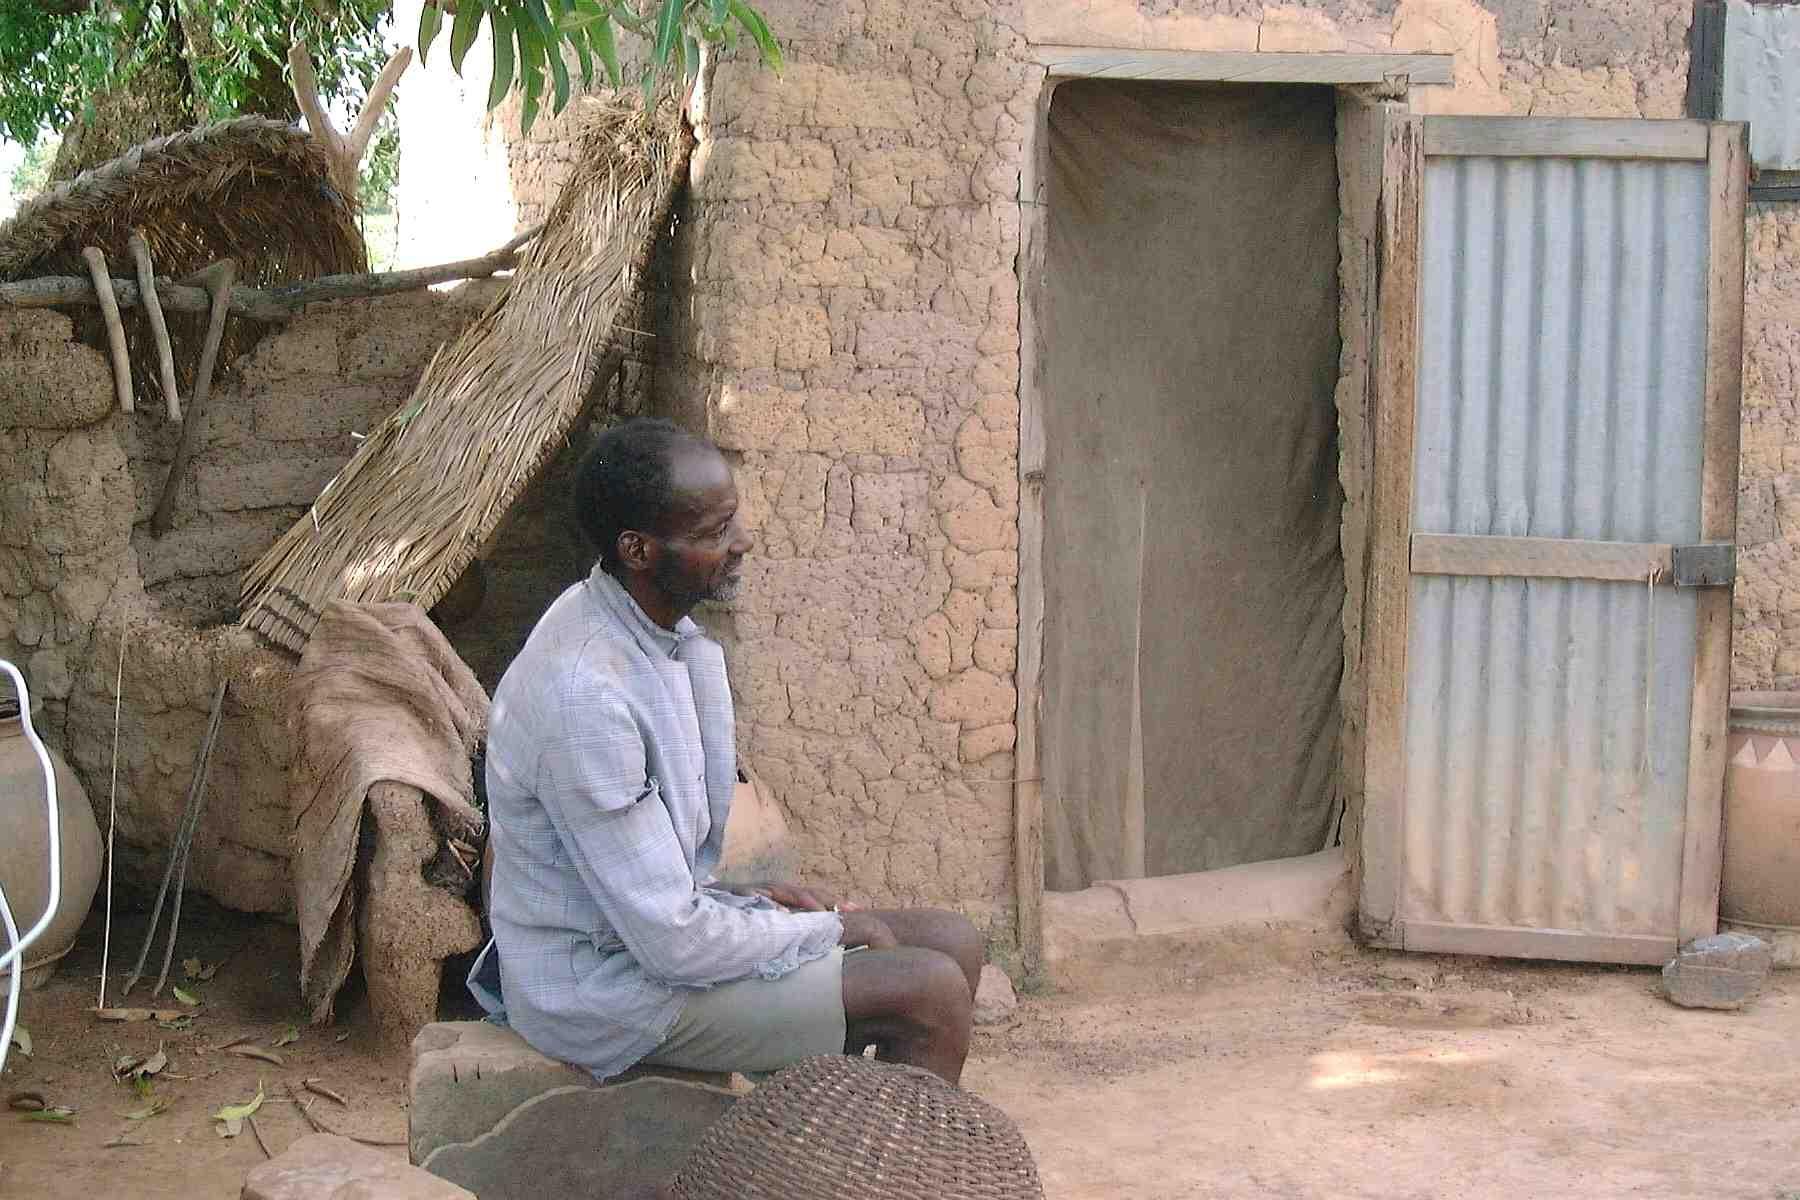 Resident in Burkina Faso